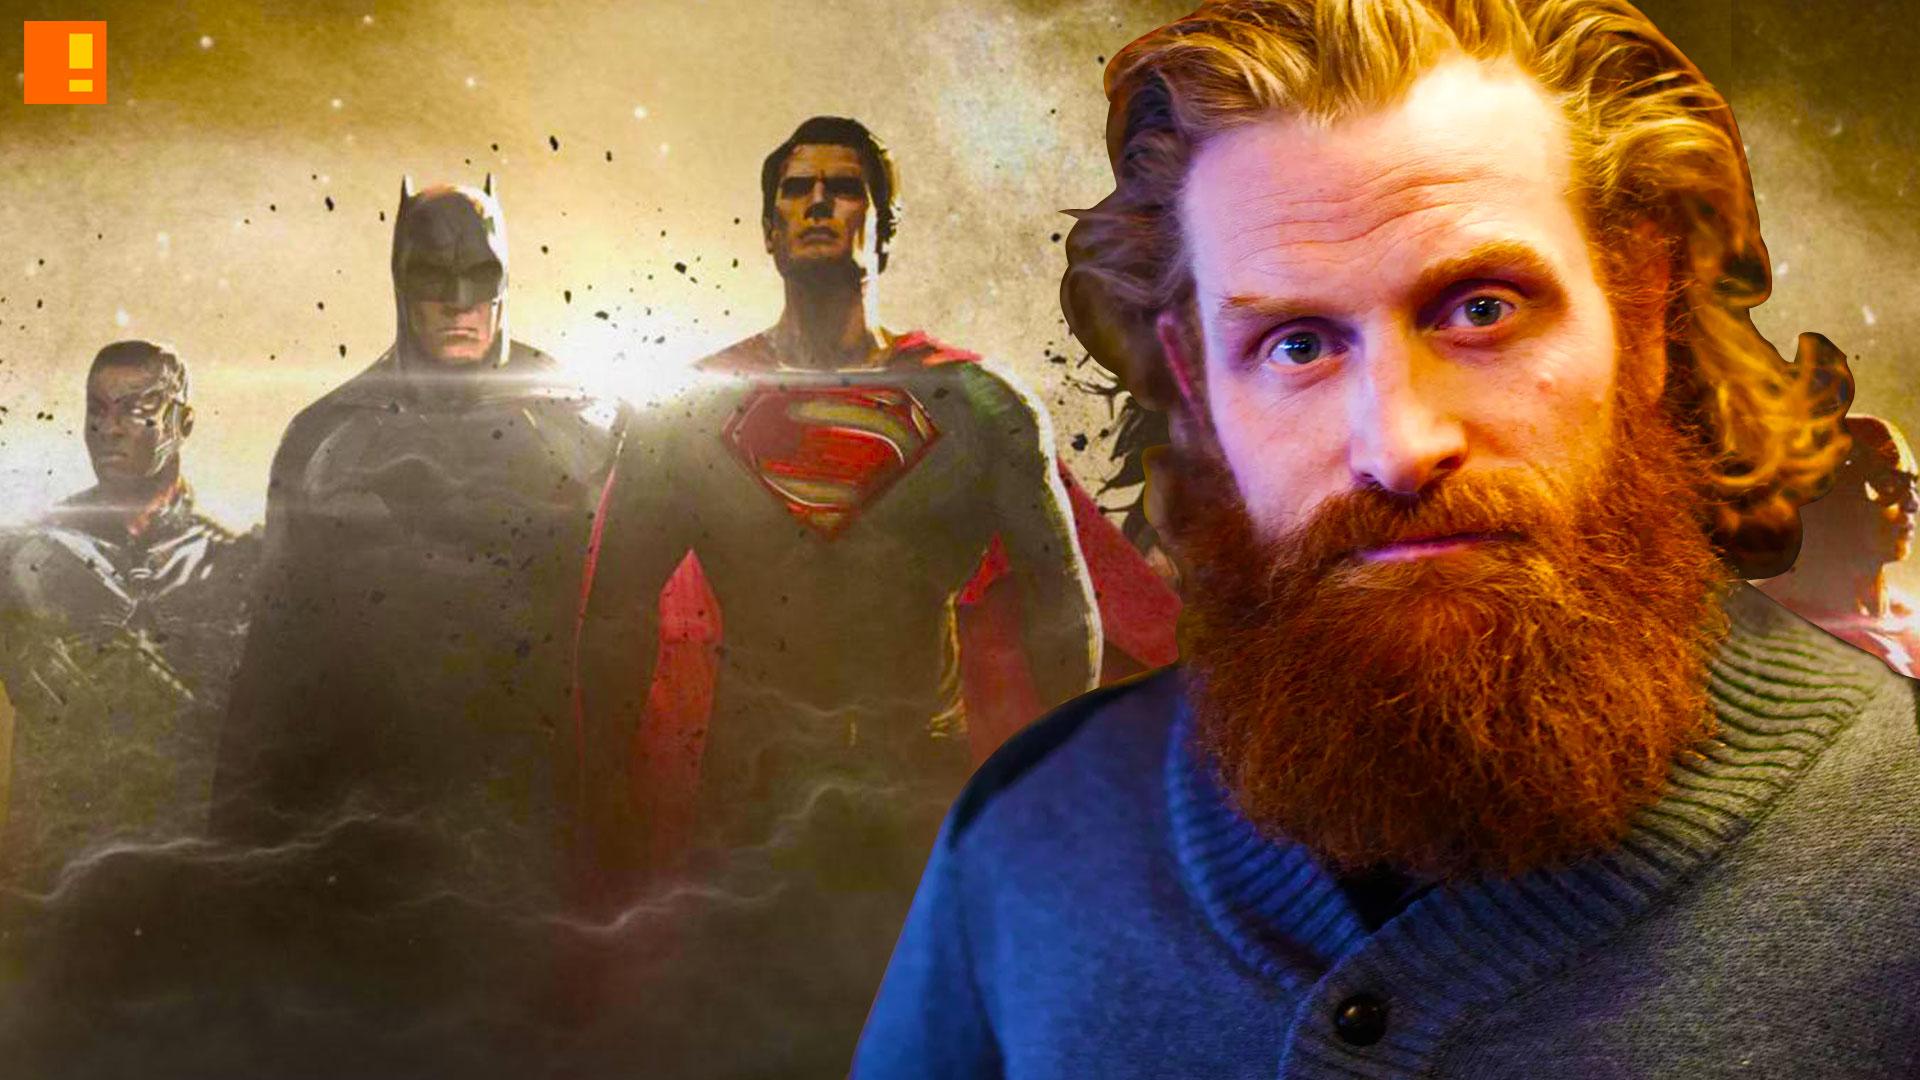 kristofer hivju, justice league, dc films, superman, atlantean king, atlantis, aquaman, dc comics, dc entertainment , game of thrones